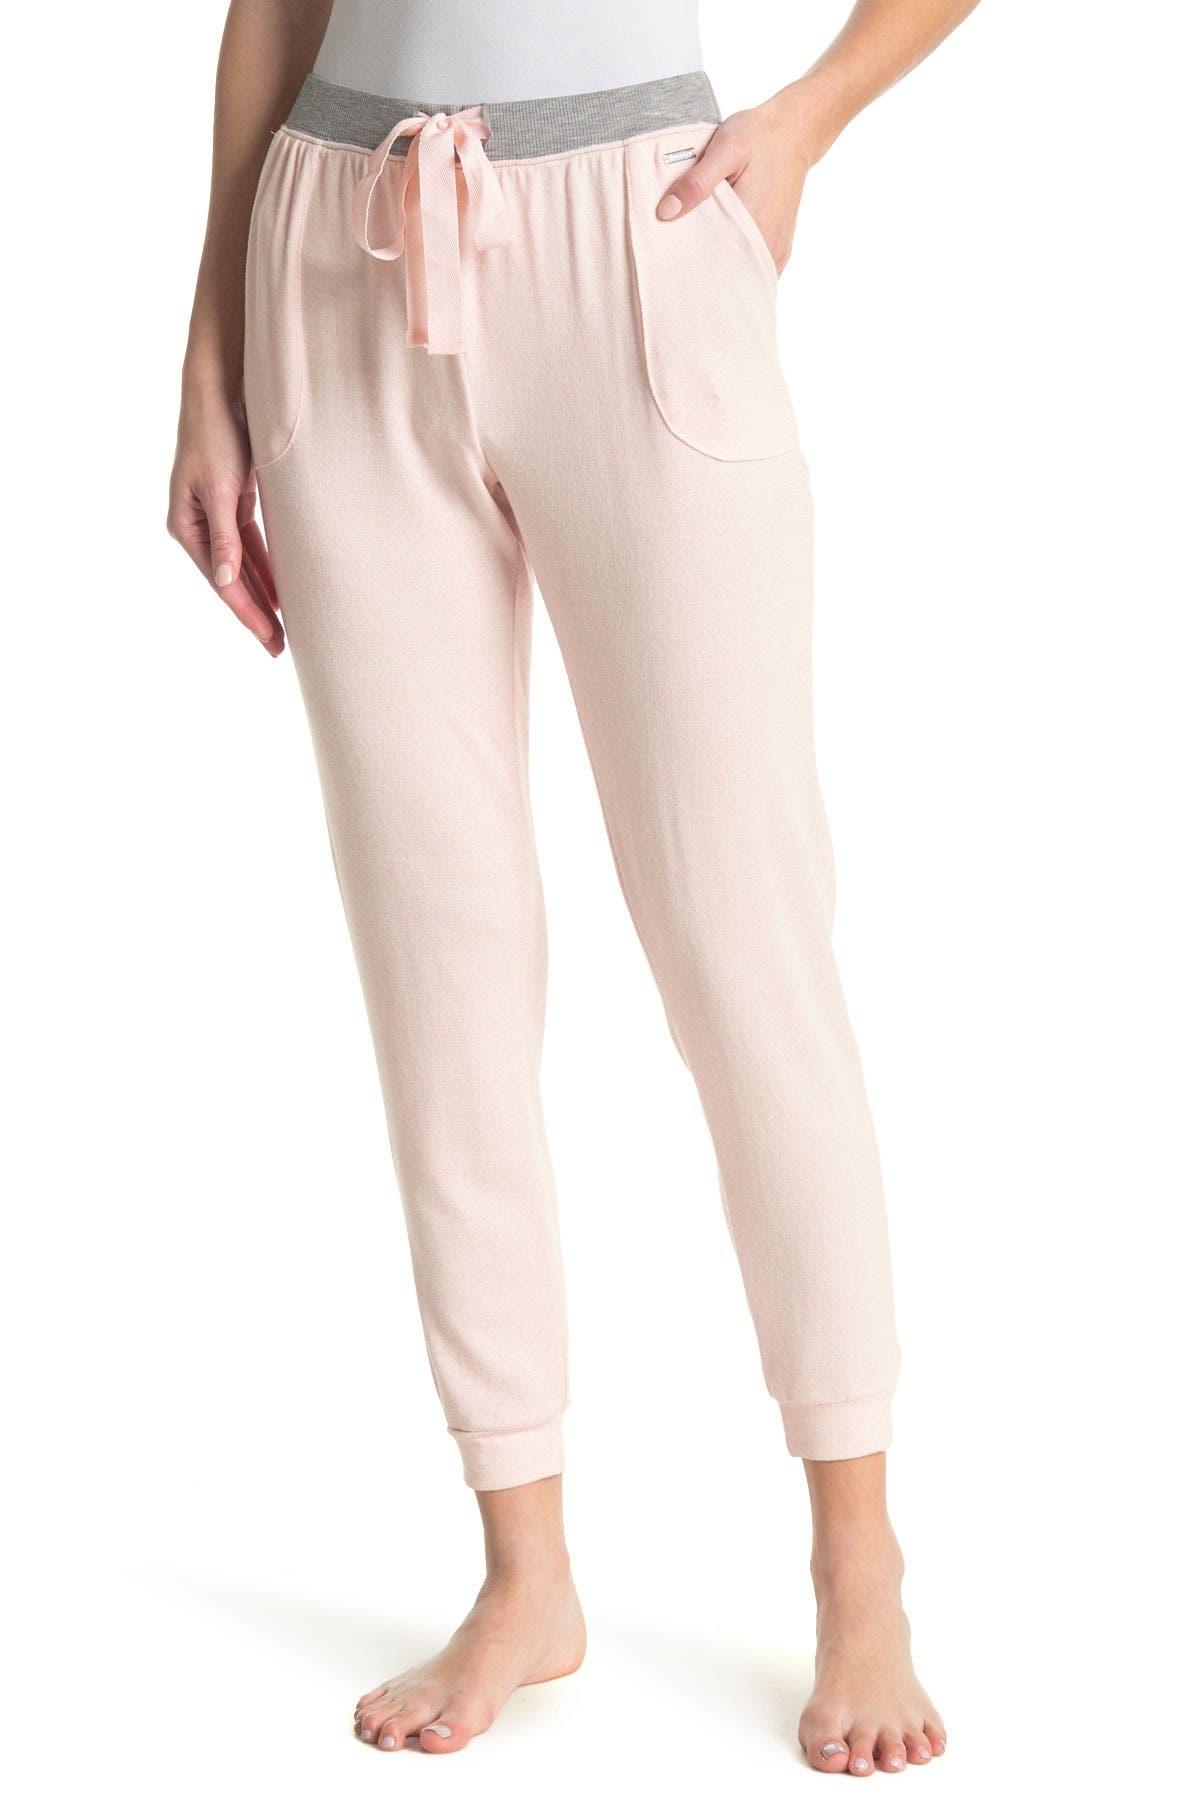 Image of Tahari Pocket Pajama Joggers